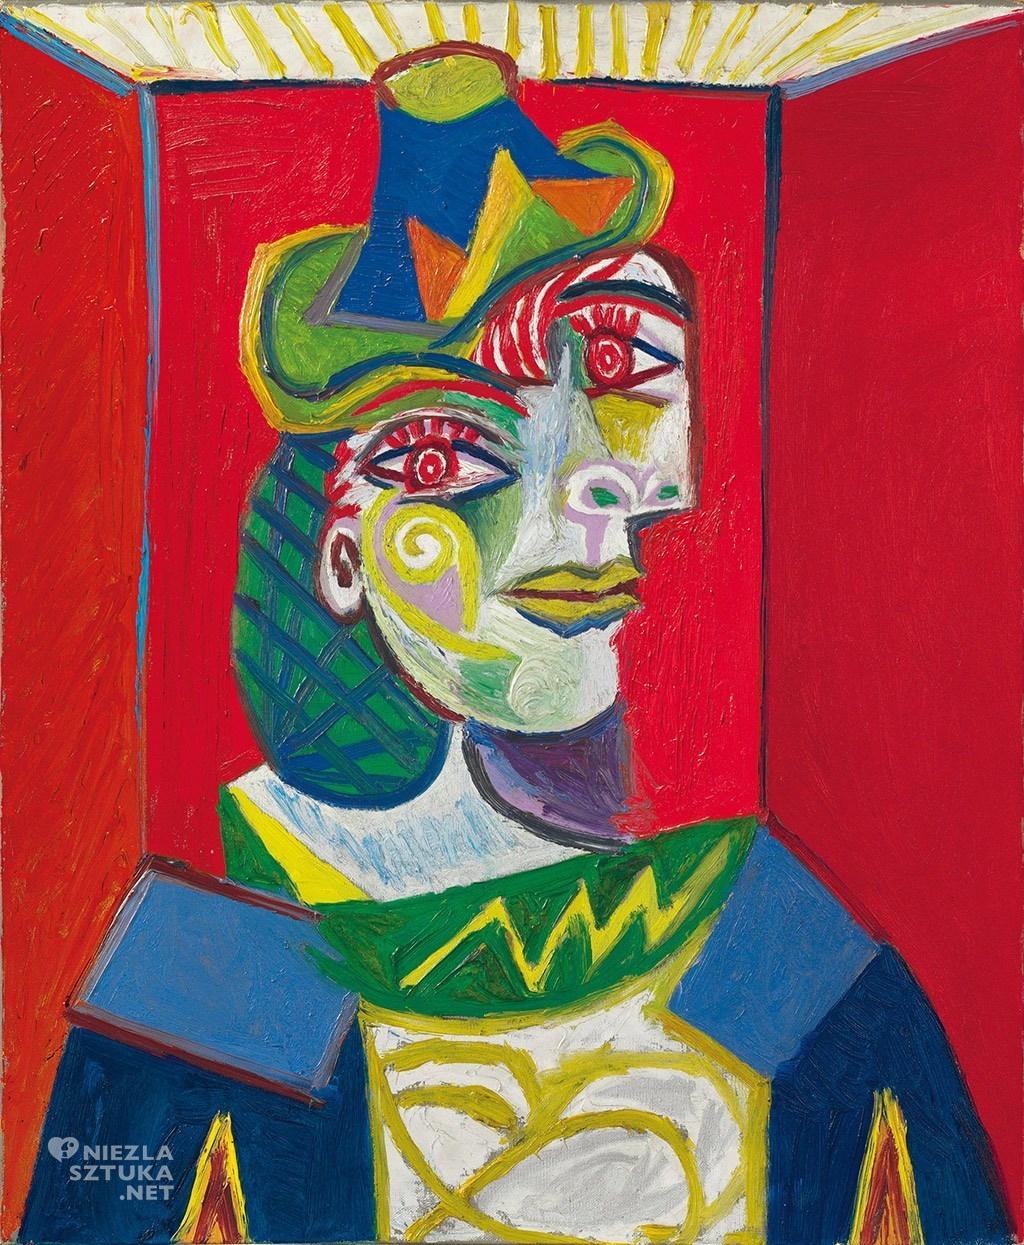 Pablo Picasso, Popiersie kobiety, Buste de femme, kubizm, kobiety Picassa, Dora Maar, Niezła Sztuka